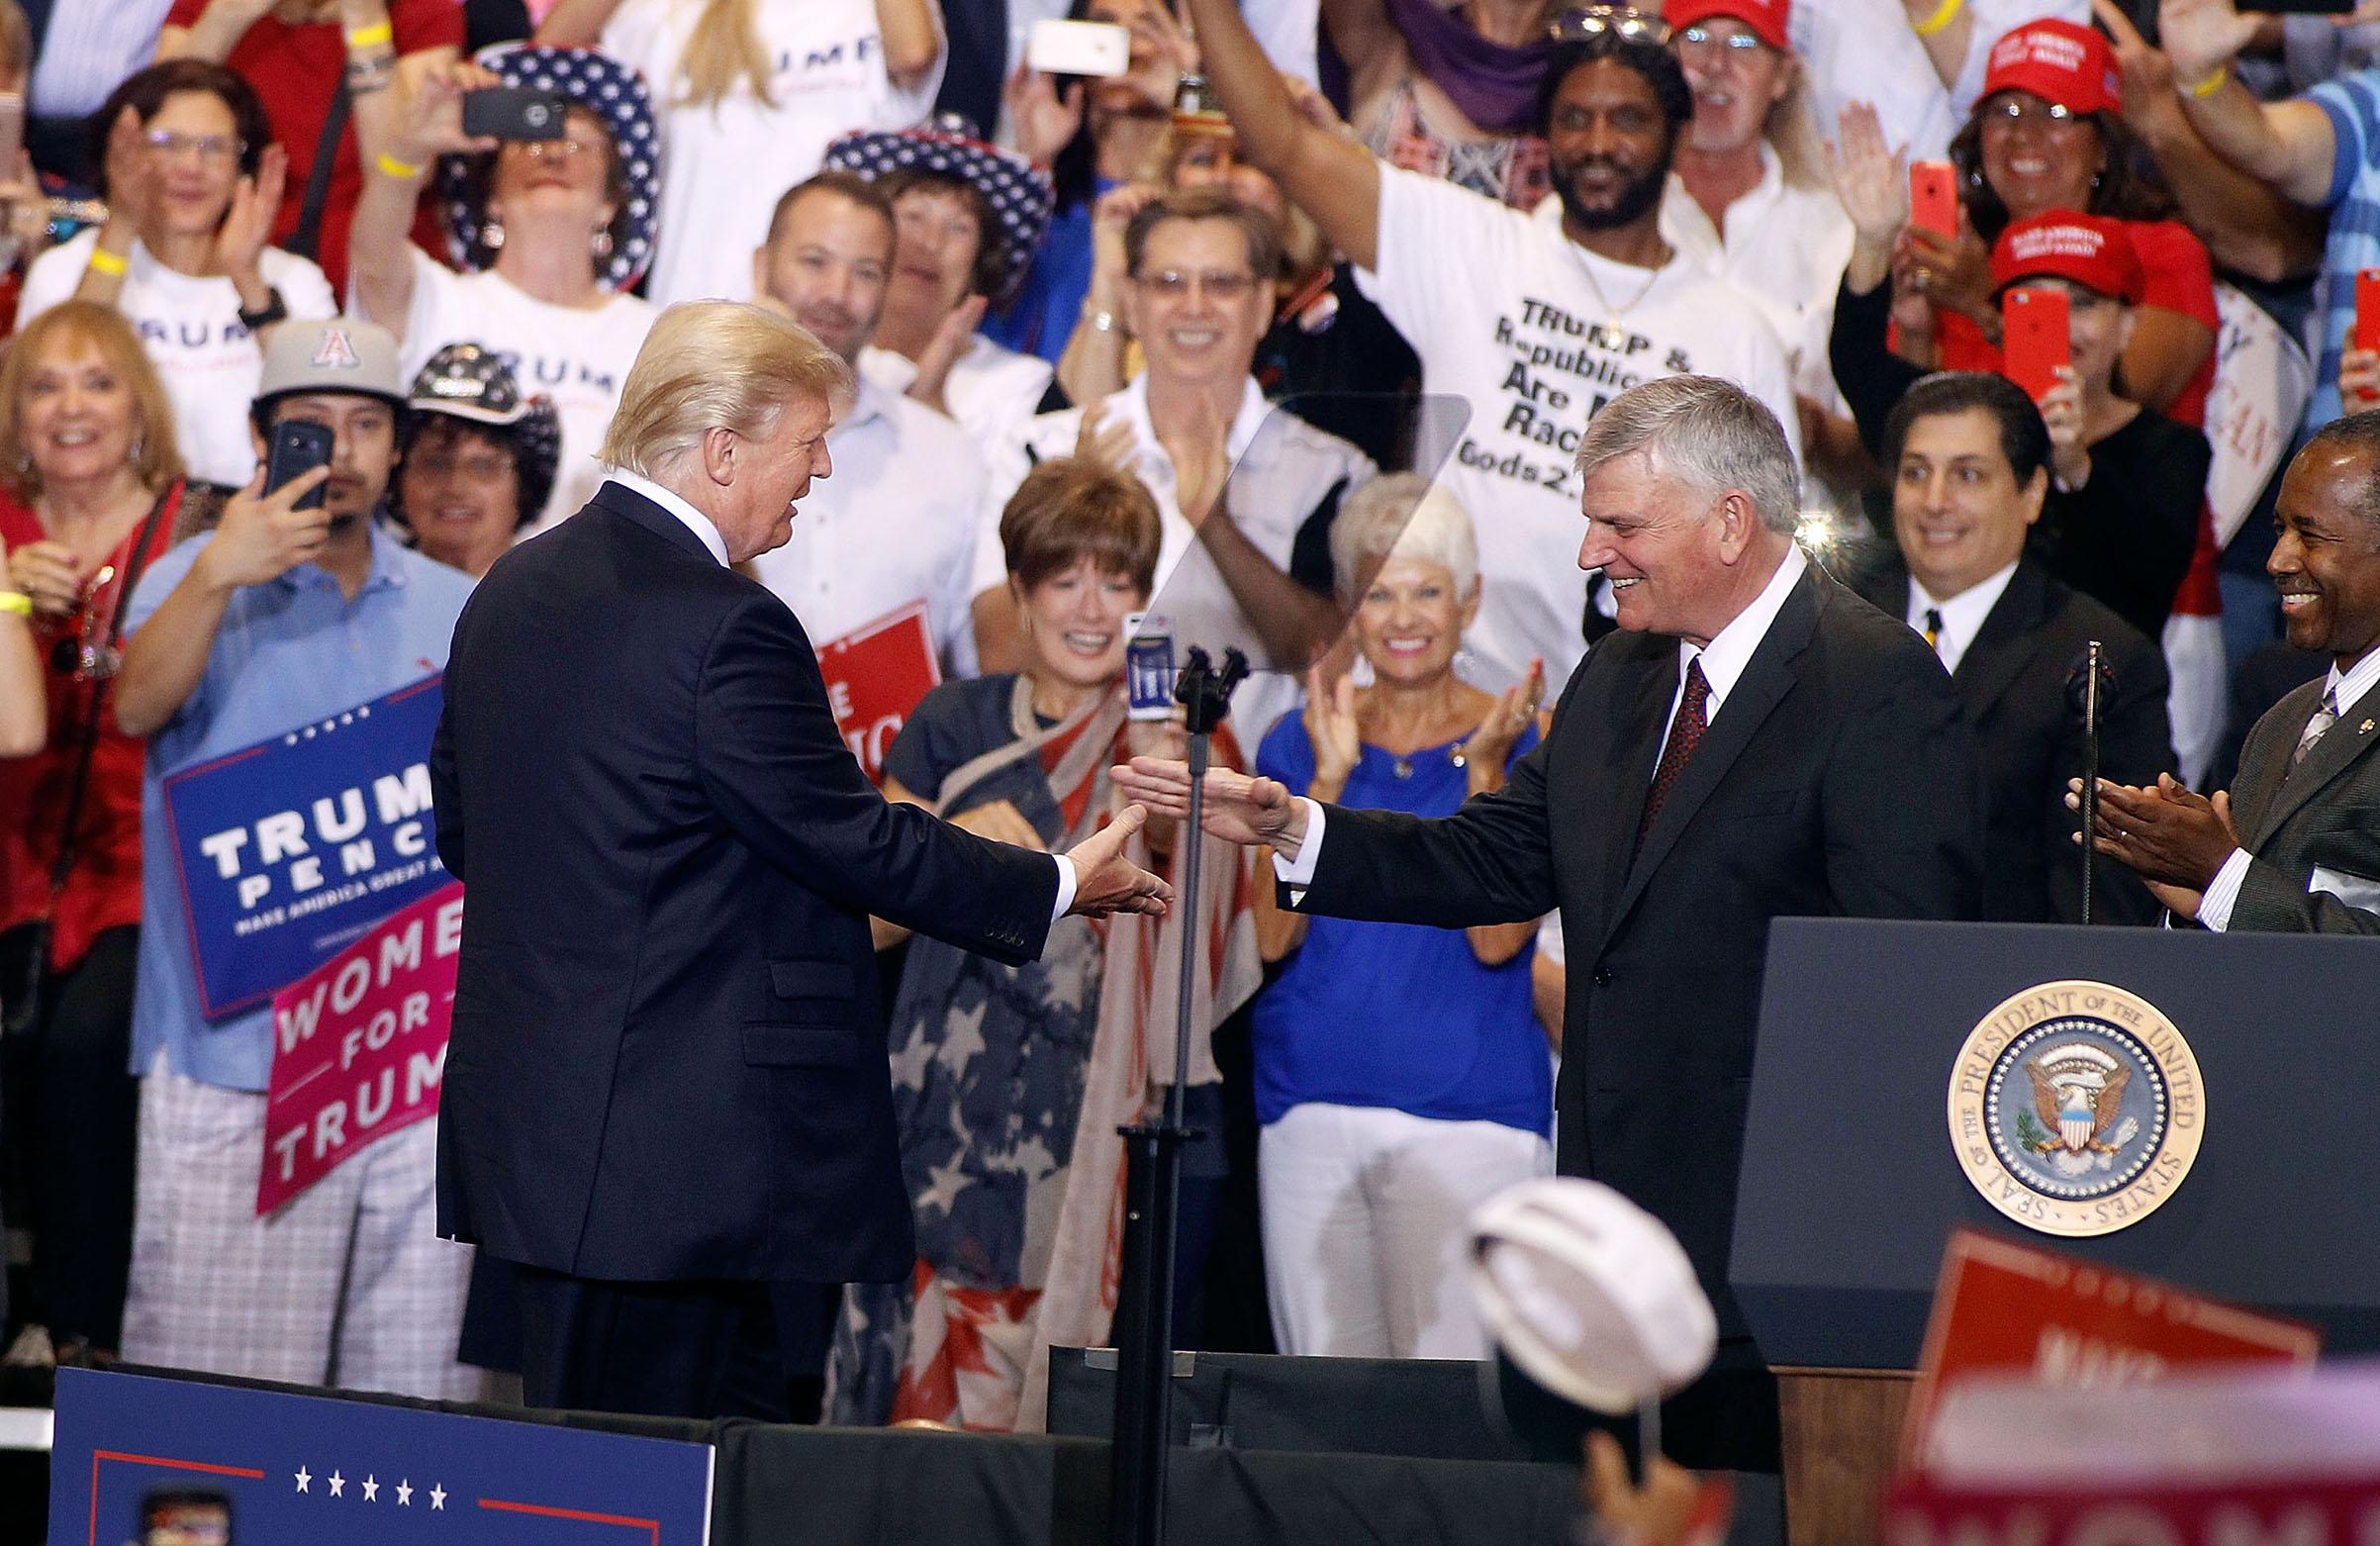 Trump greets Franklin at a campaign event in Arizona in 2017